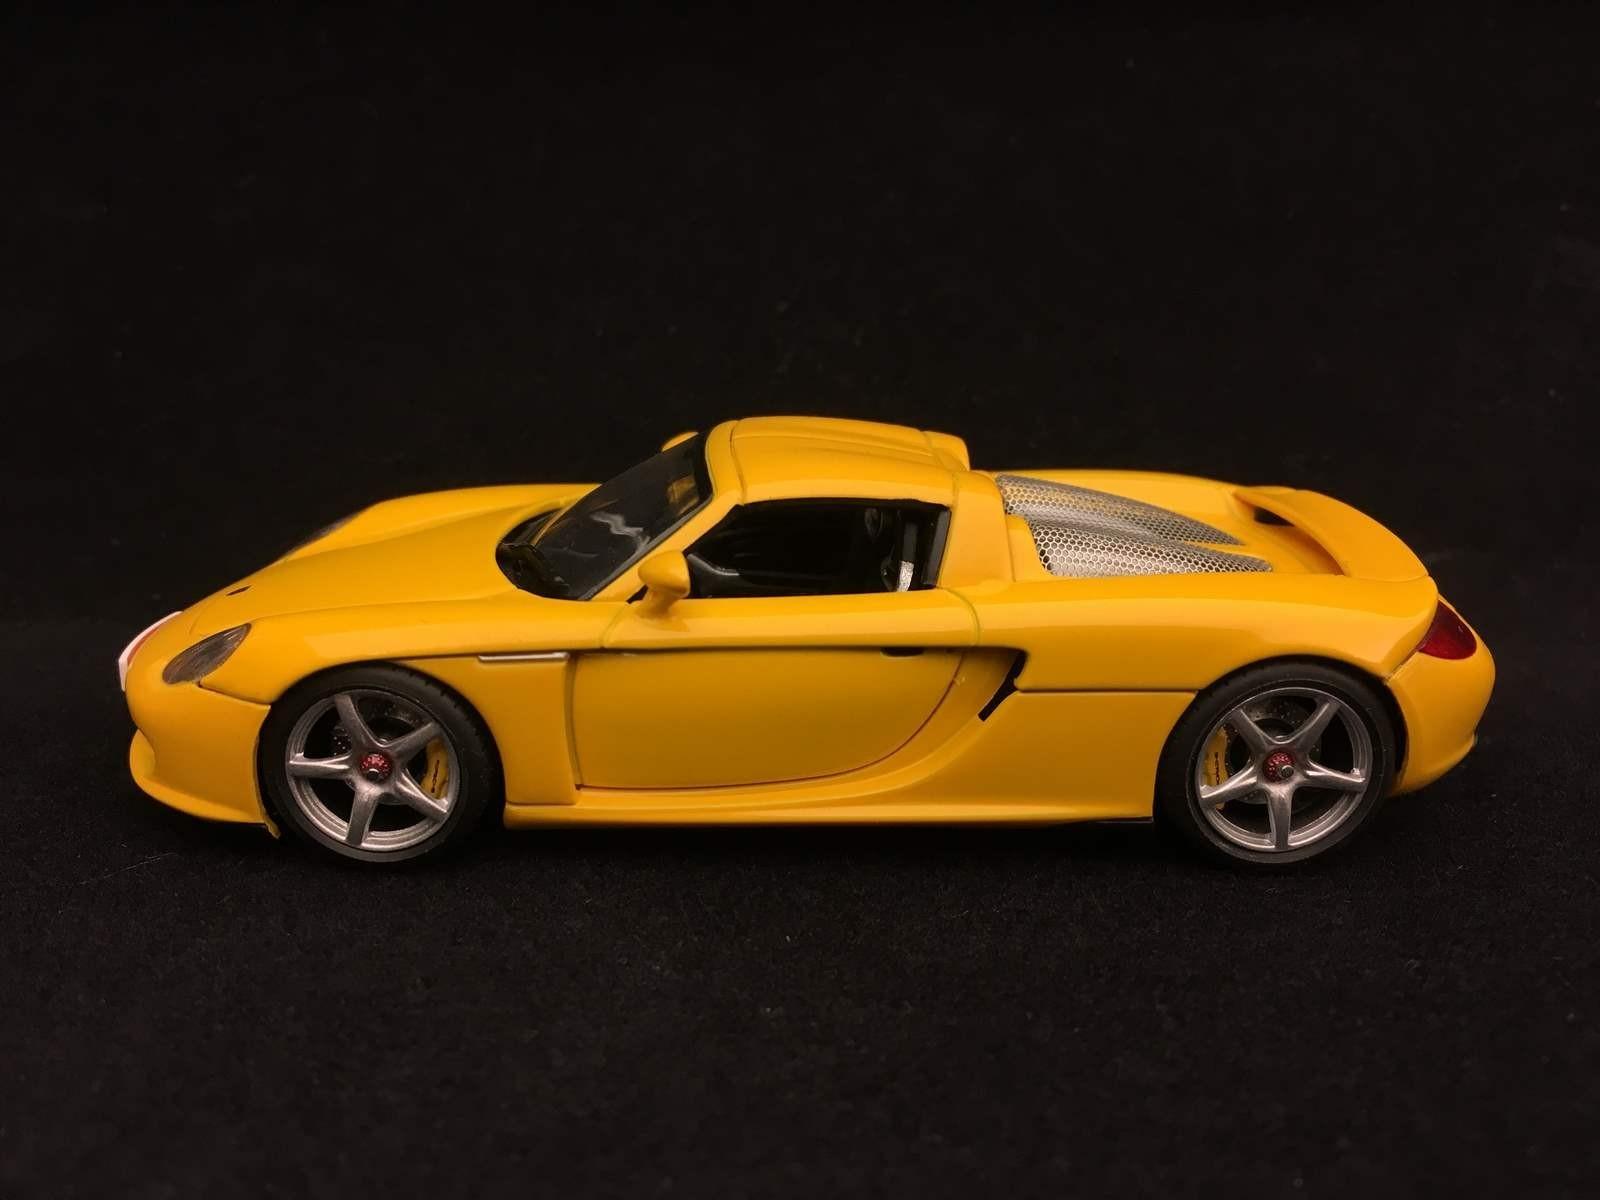 Porsche Carrera Gt 2003 Speed Yellow 1 43 Autoart 58044 Selection Rs